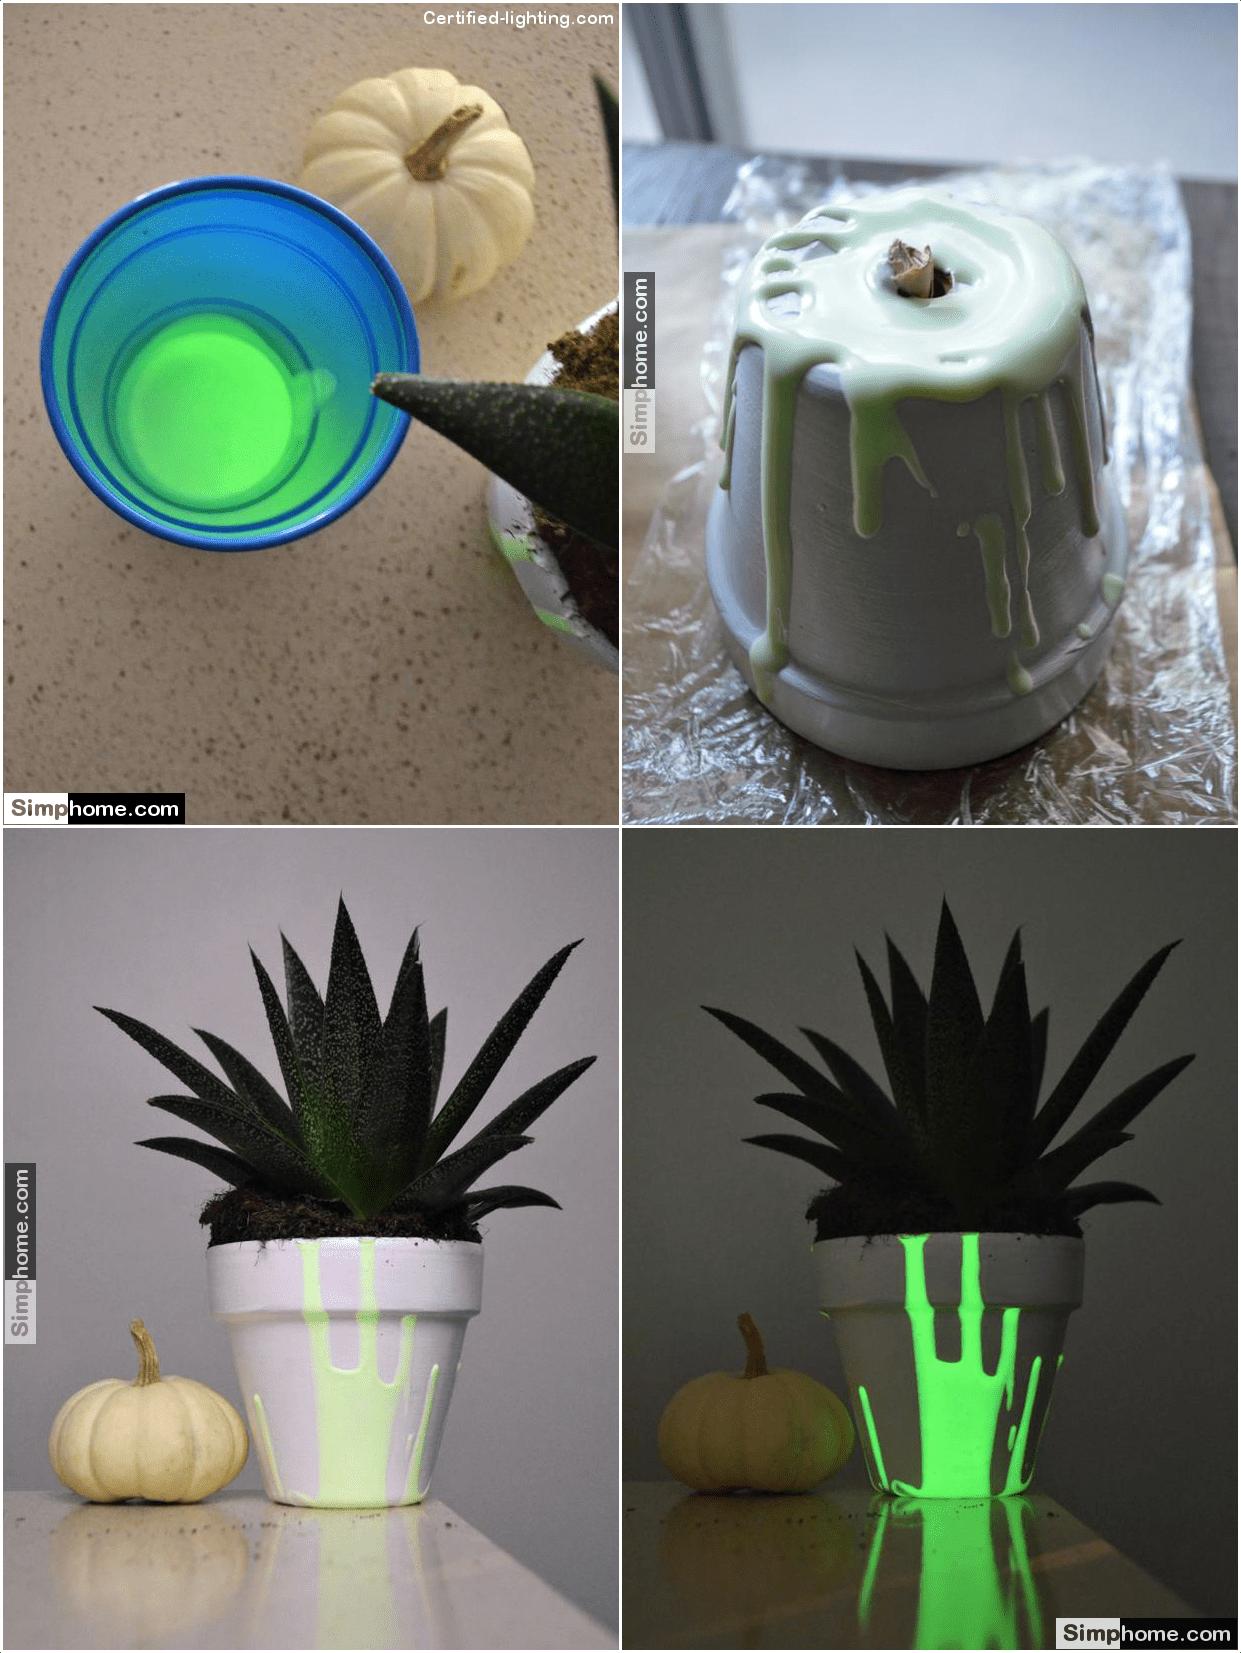 4.Fantastic Backyard Lighting Idea via Simphome.com